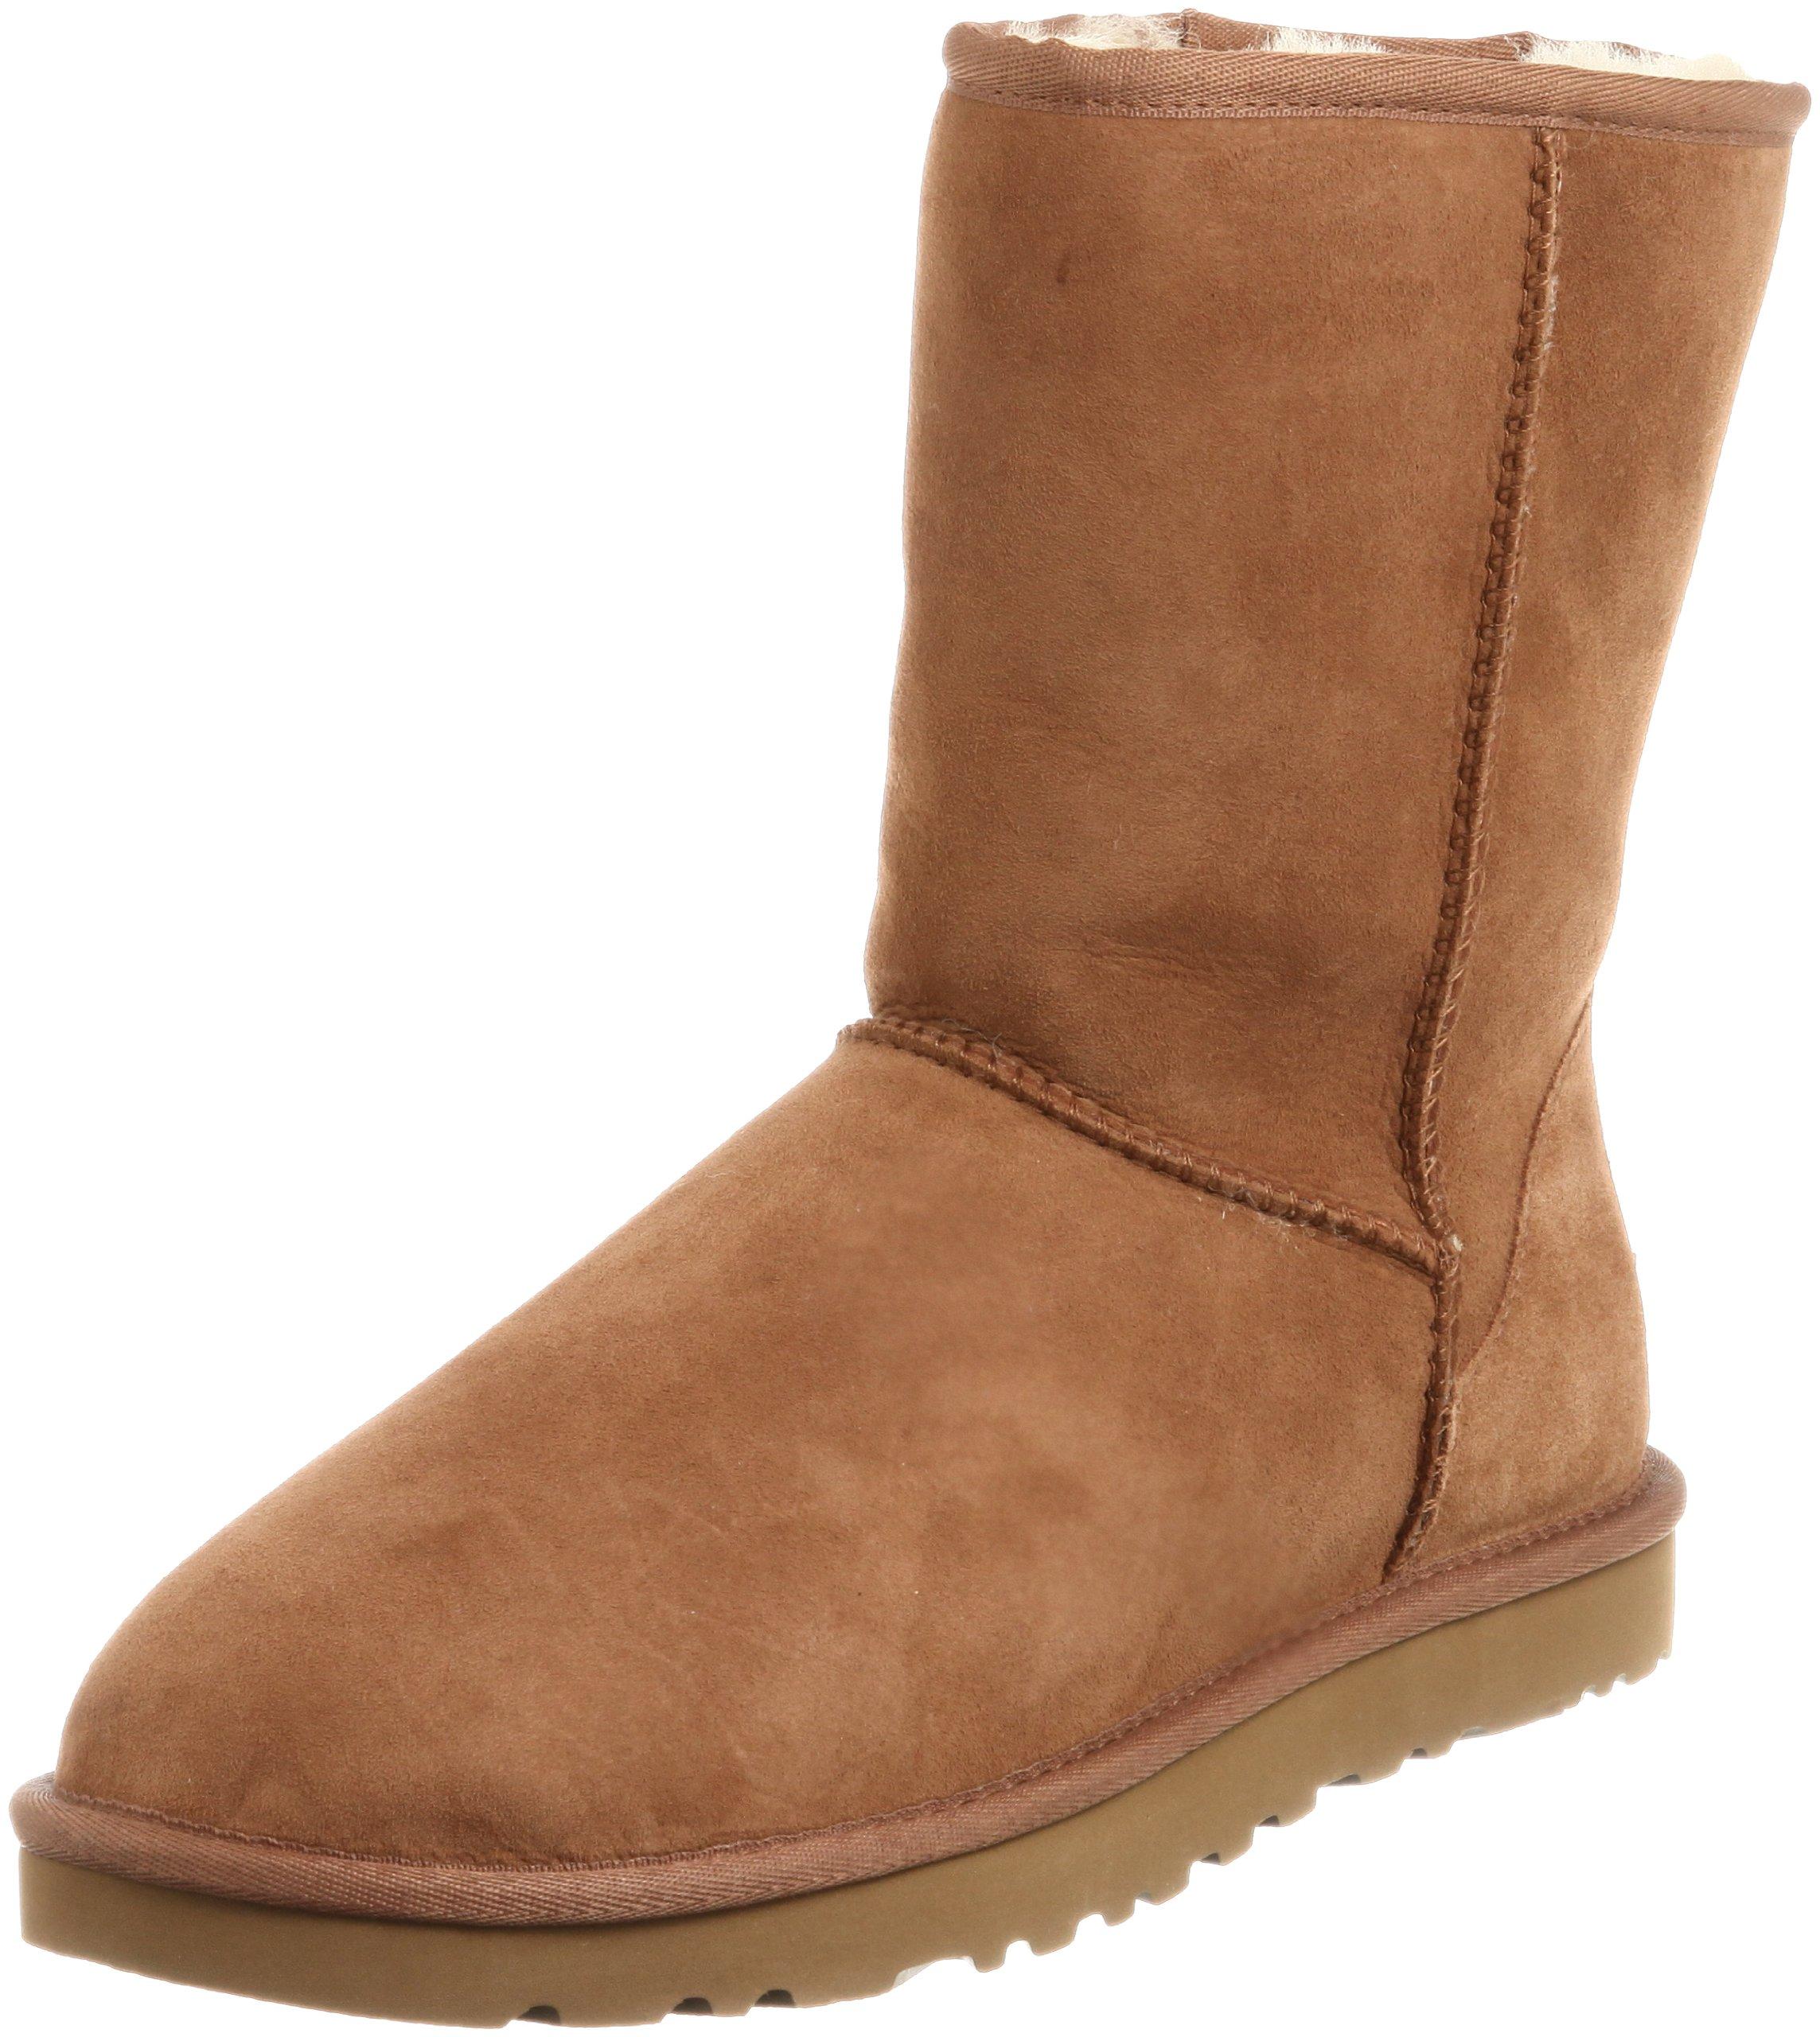 UGG Men's Classic Short Sheepskin Boots, Chestnut, 11 D(M) US by UGG